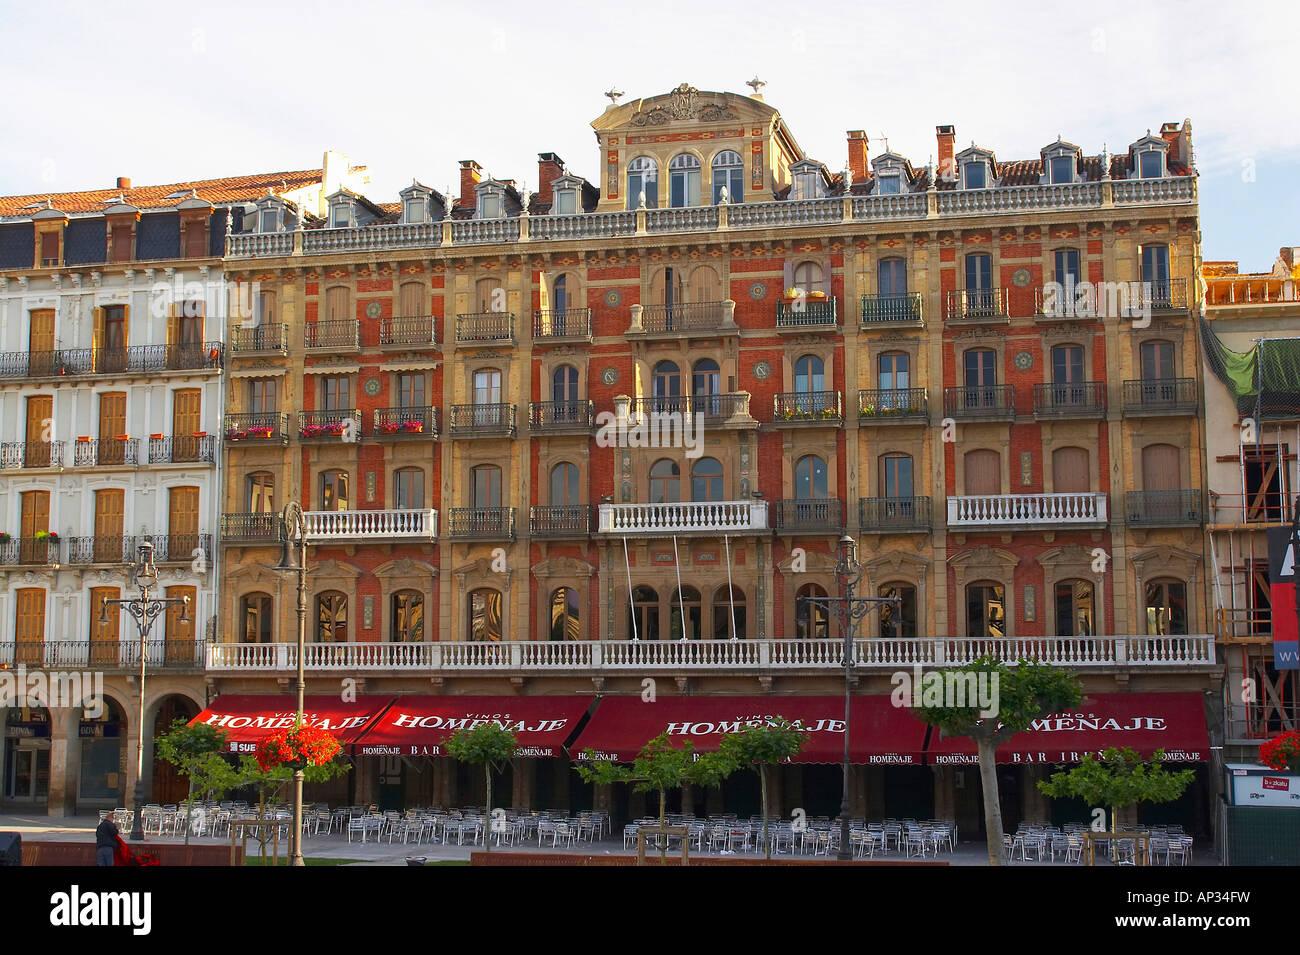 Cafe Iruna, Ernest Hemingways favourite cafe, Plaza del Castillo, Pamplona, Navarra, Spain - Stock Image